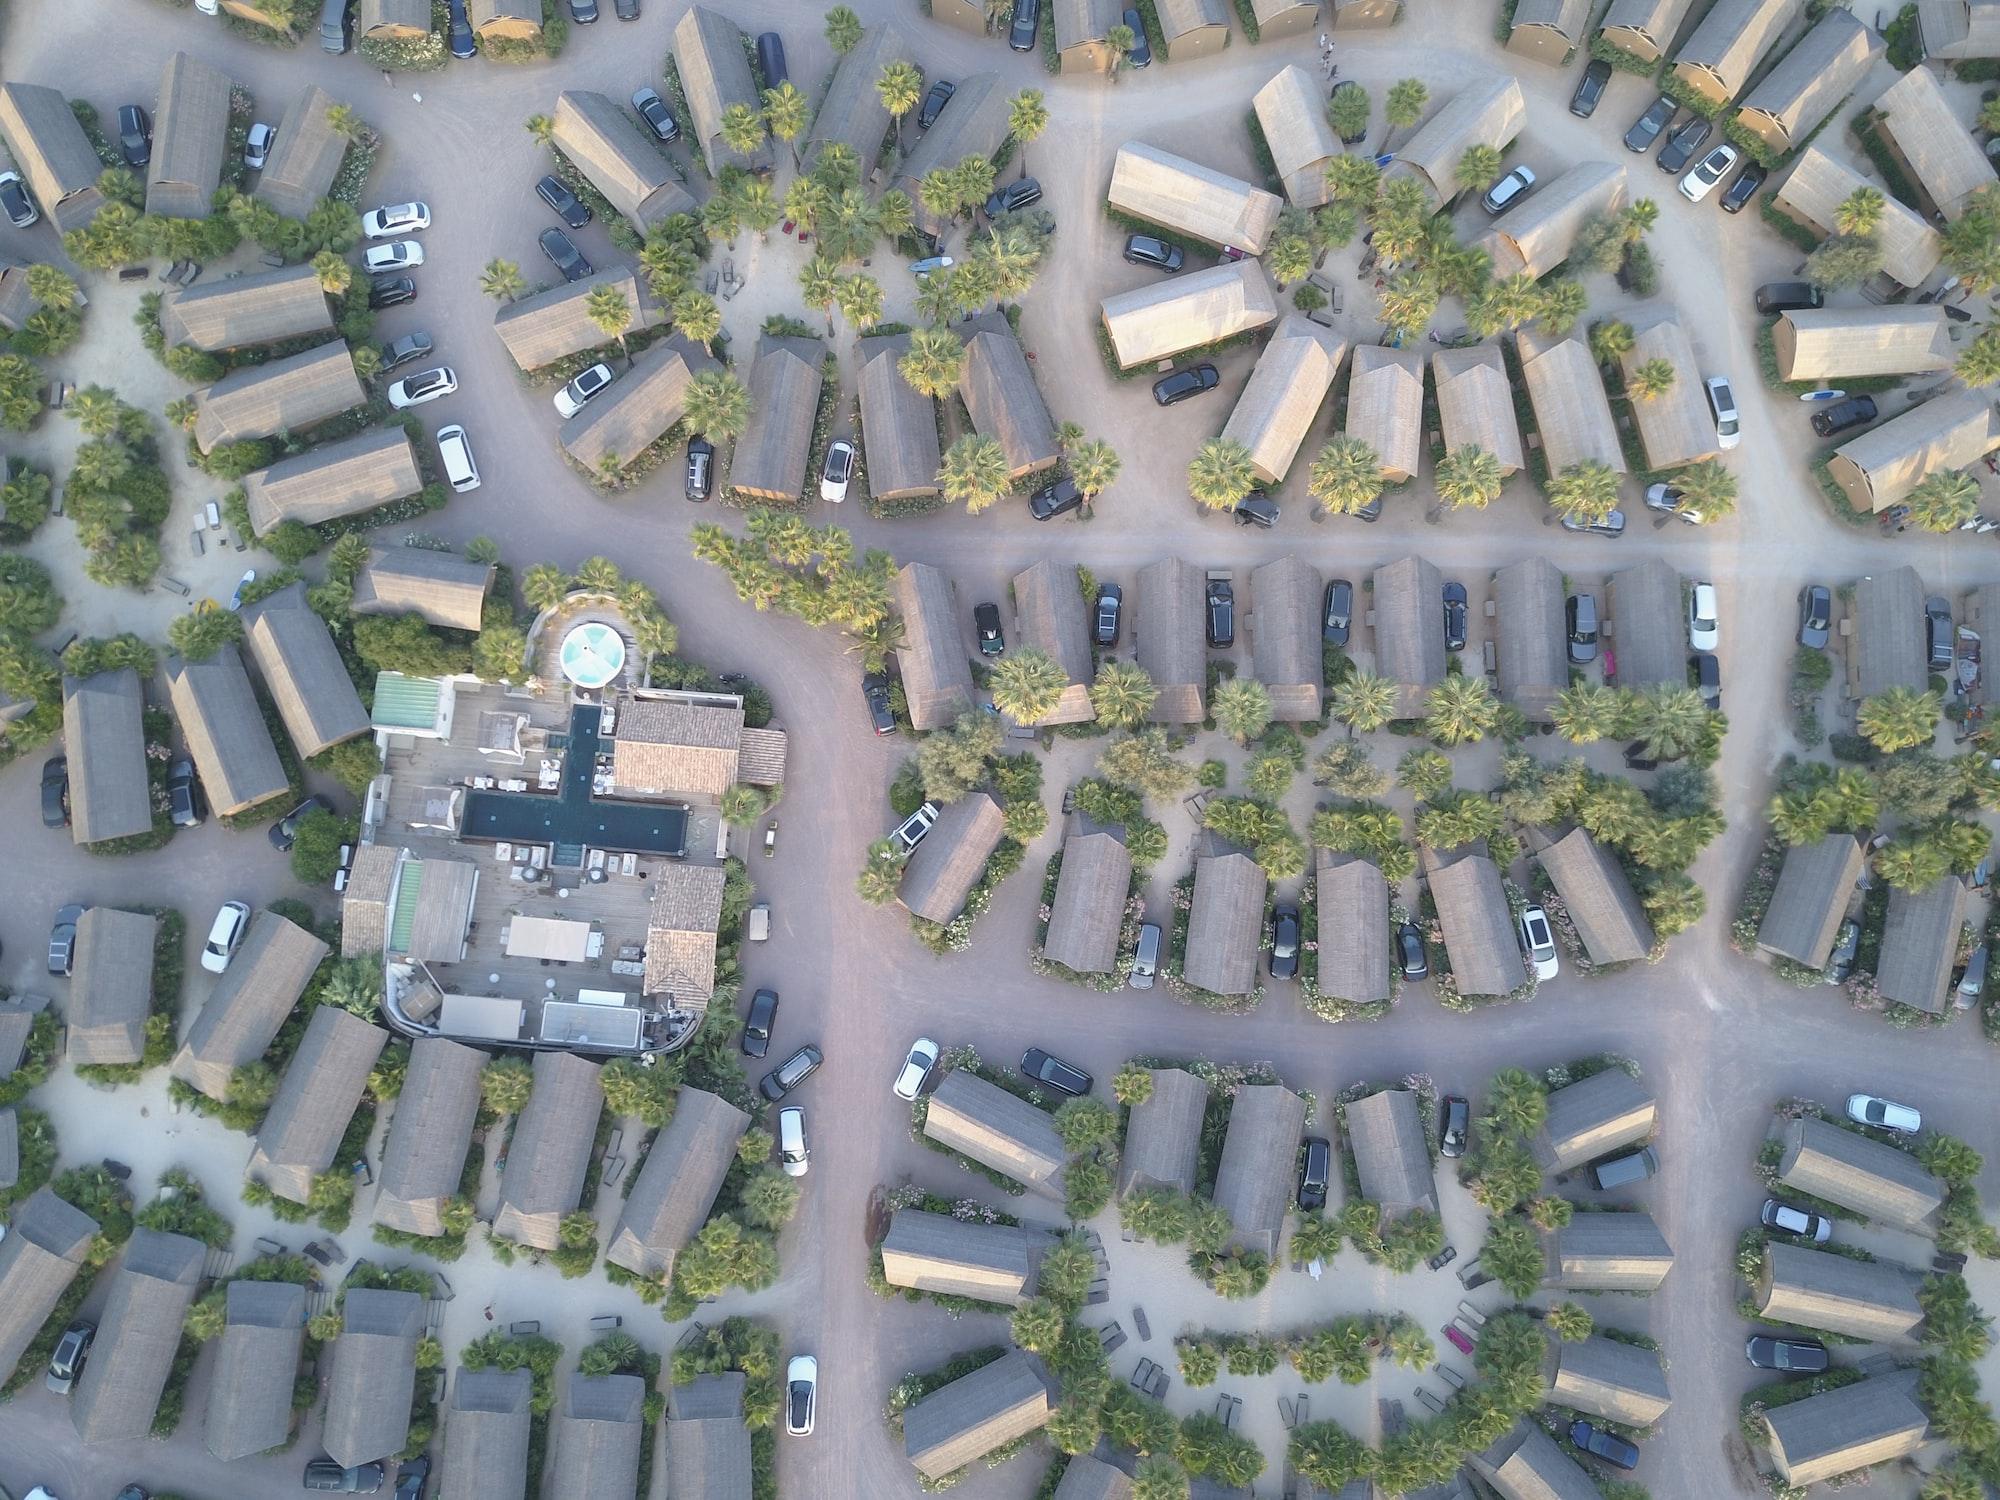 Local Intelligence Adolescence, Nextdoor's Opportunity, Delta's Danger